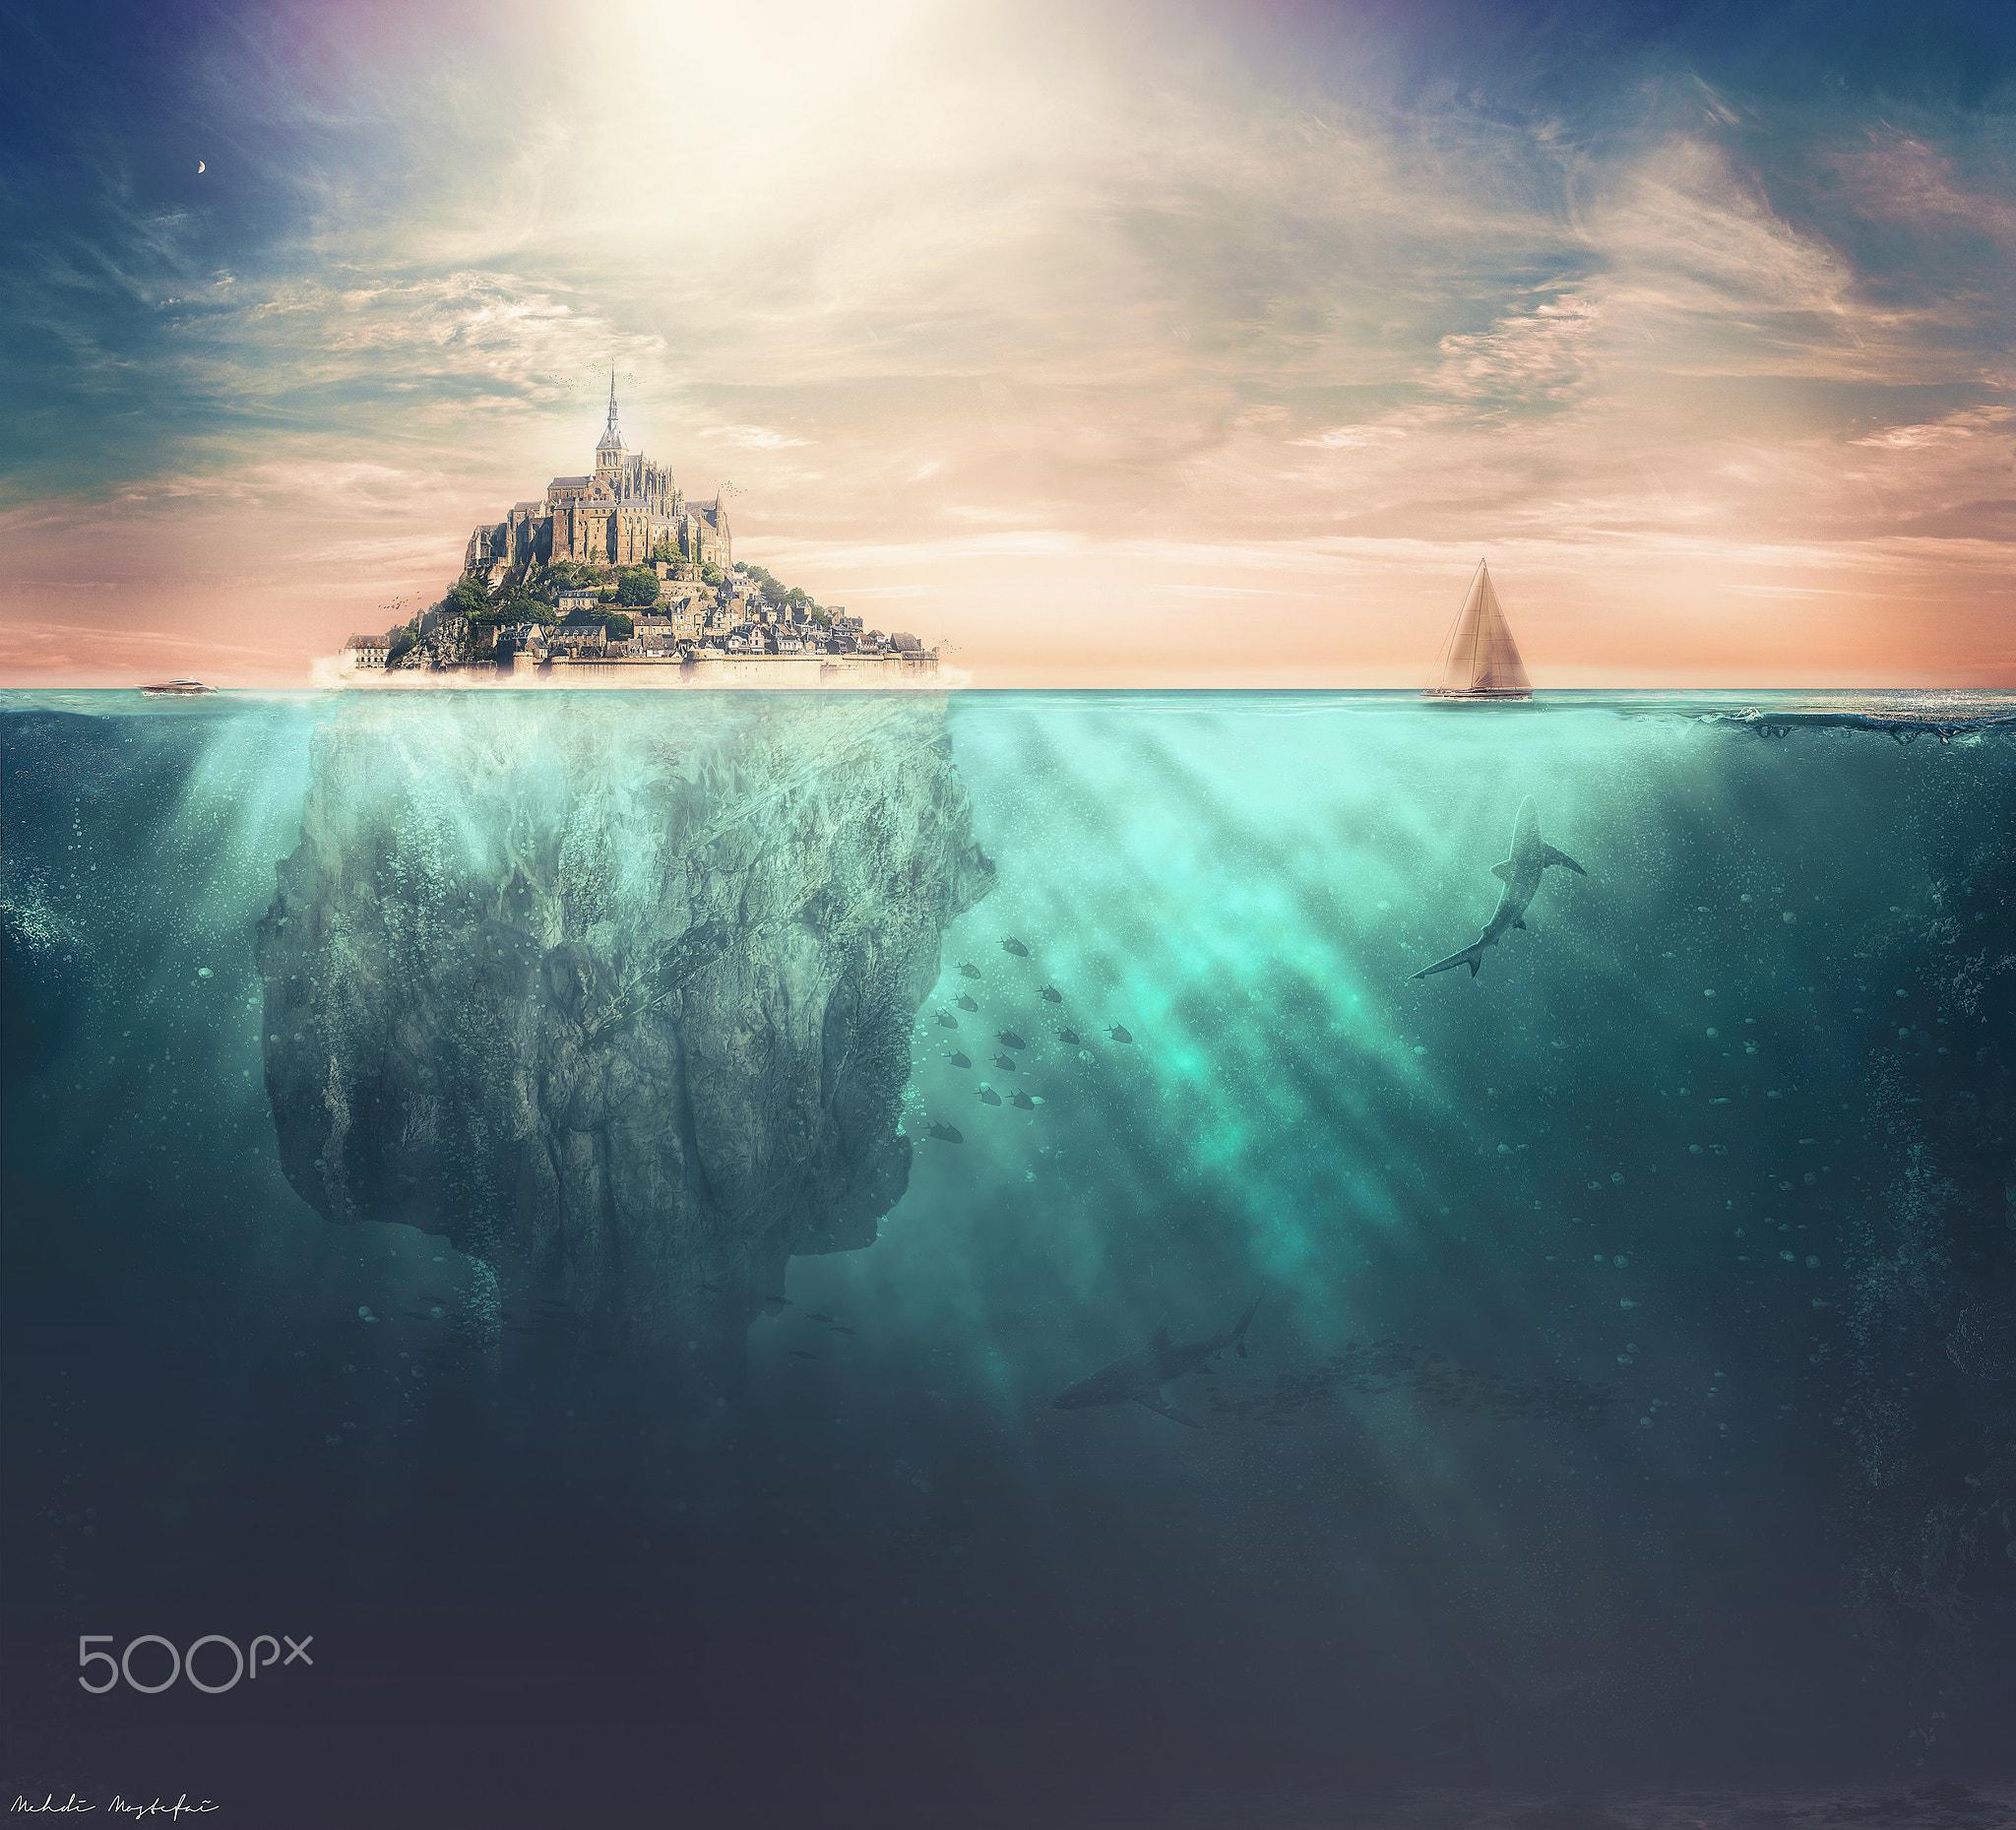 Fondos De Pantalla Arte Digital Submarino Mar Mehdi